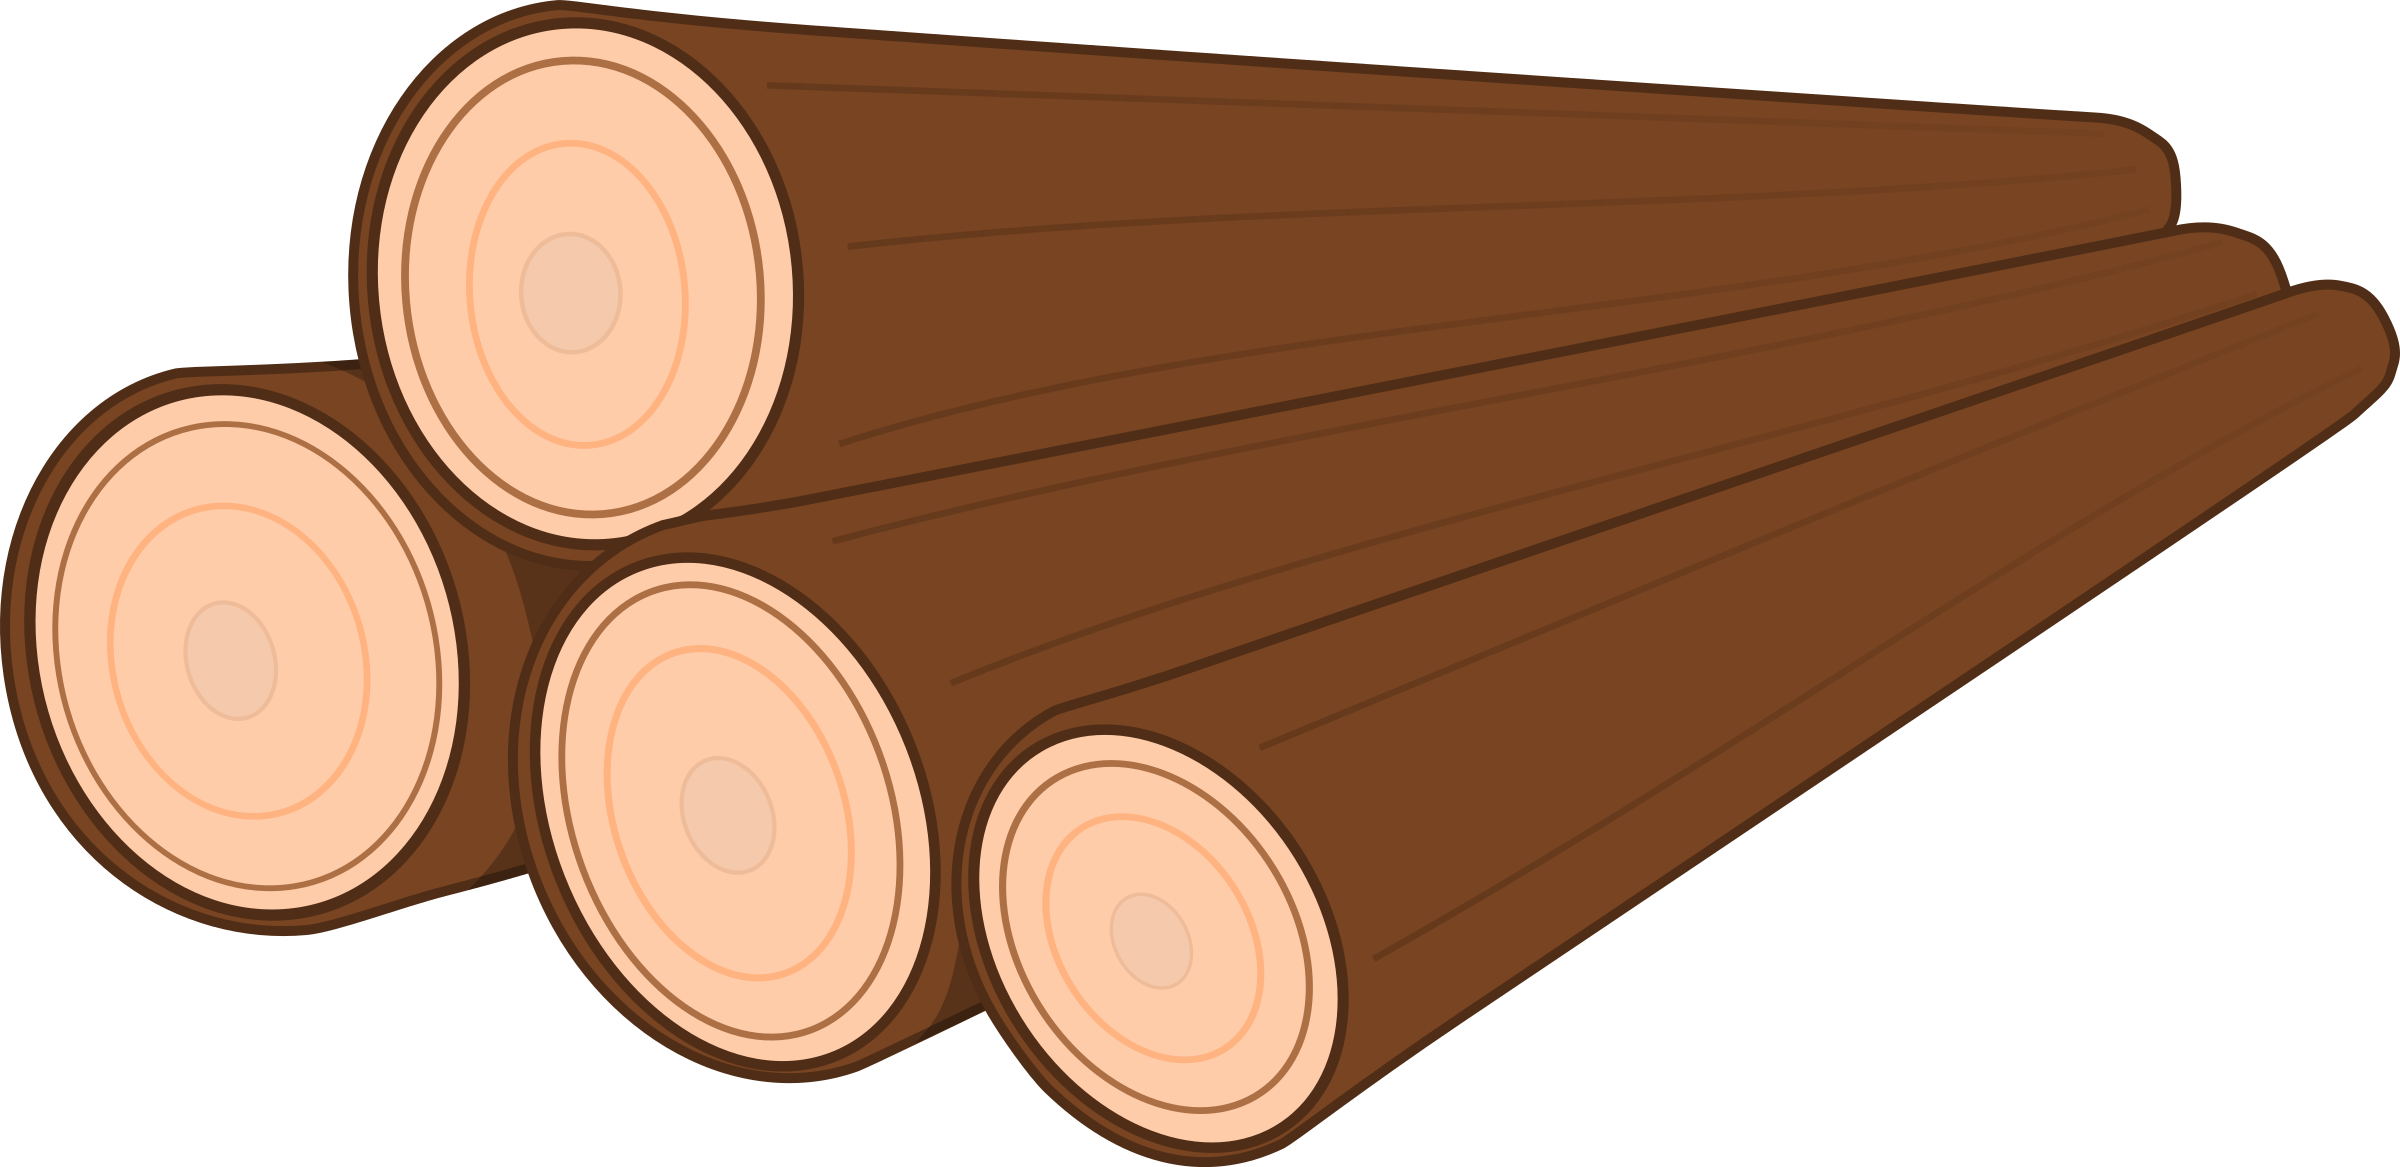 2400x1167 Wood Clipart Lumber